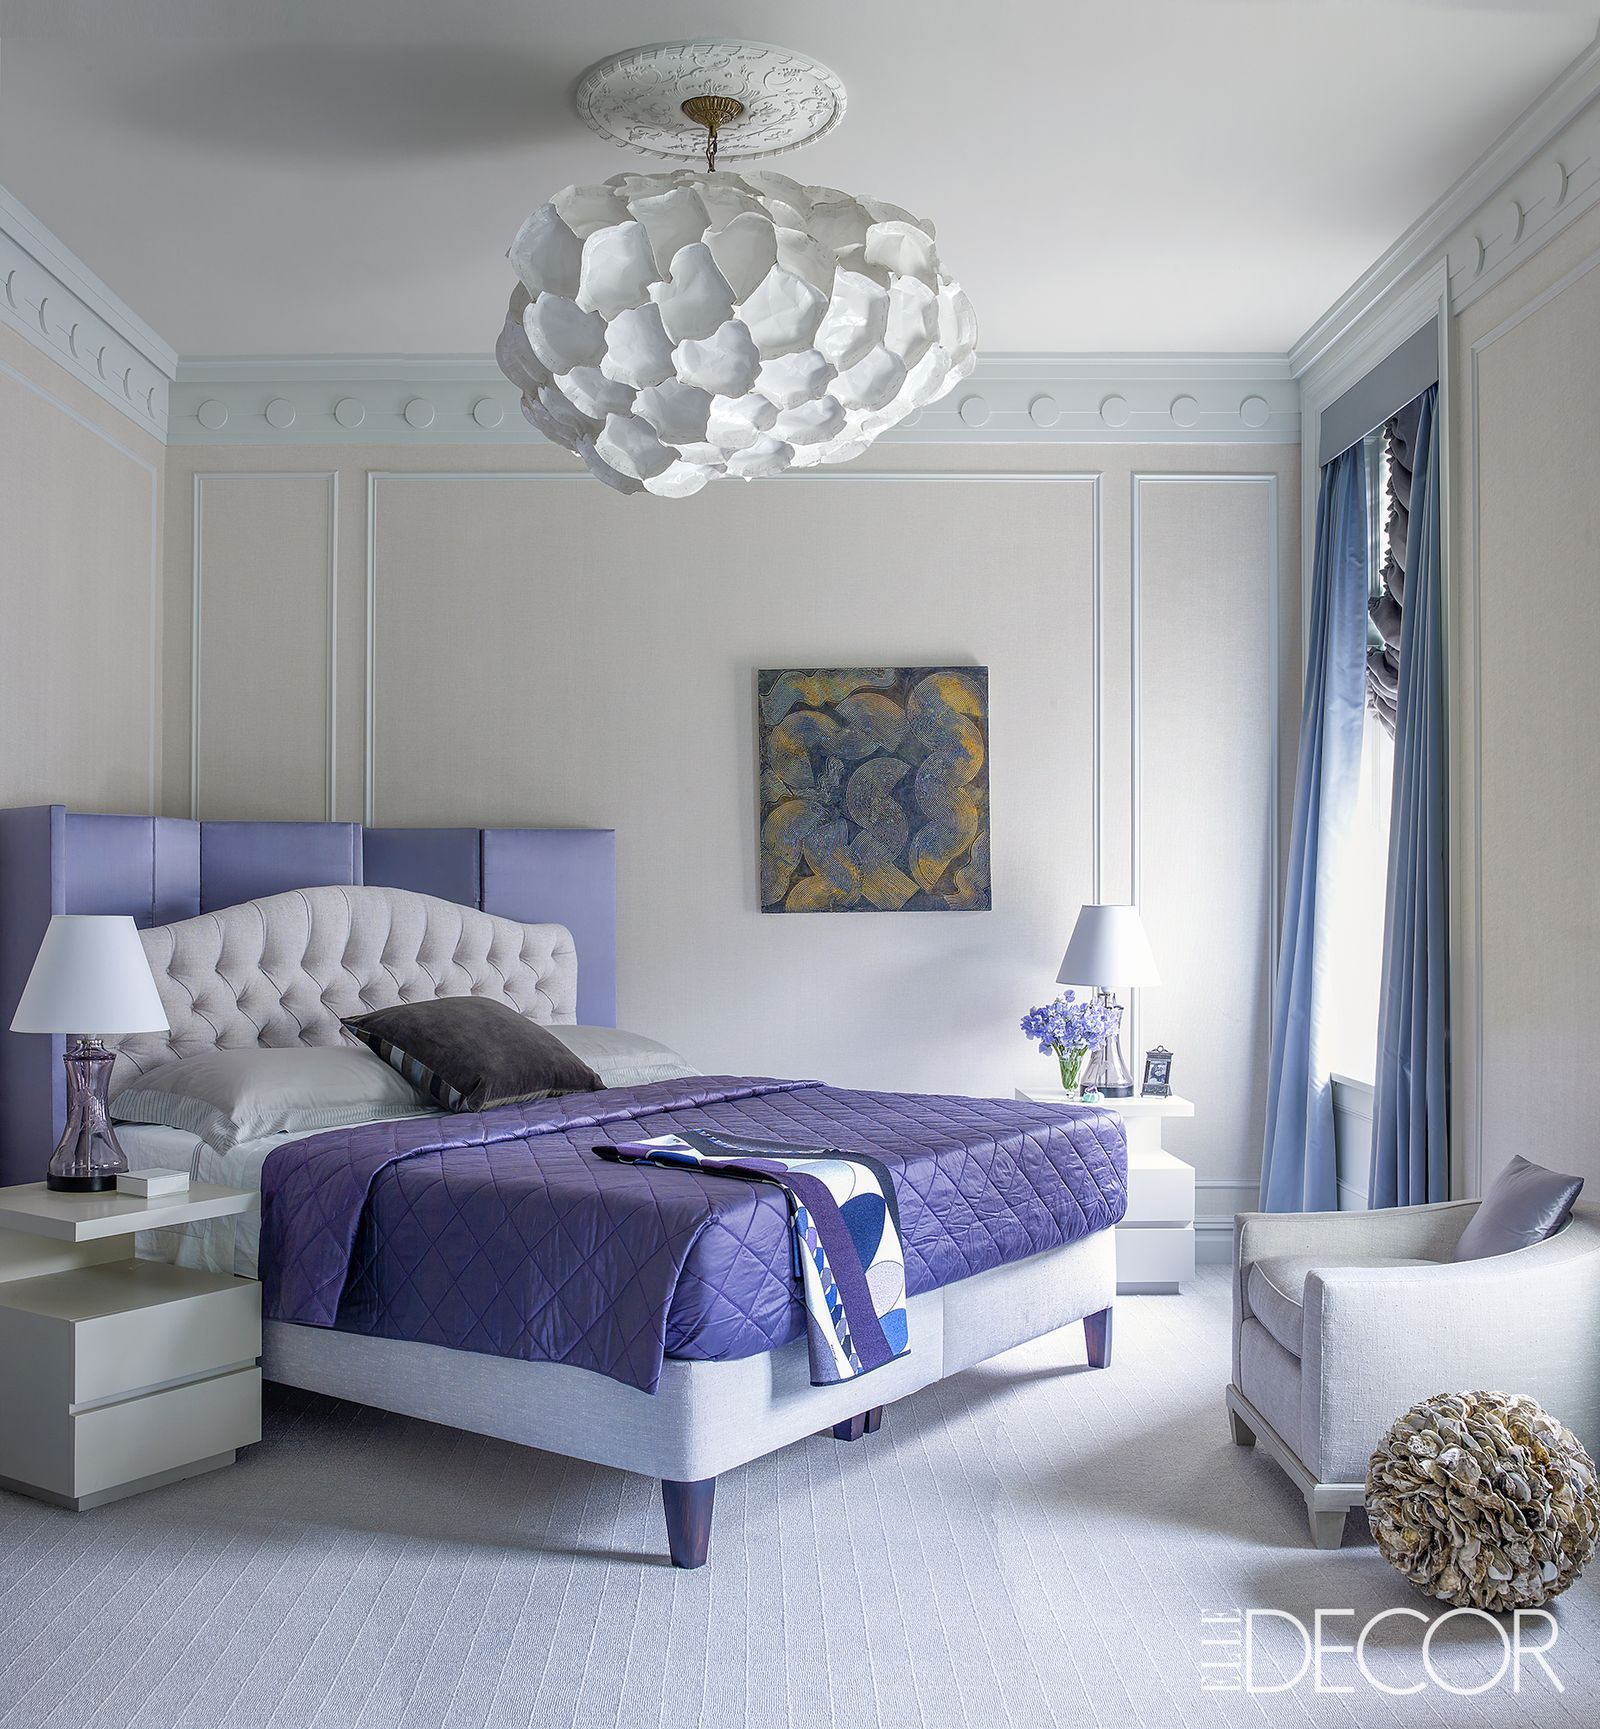 Bedroom Inspiring Bedroom Lighting Ideas Using Cool Bedroom Ceiling Light And Modern Bedside Ta Bedroom Lighting Design Bedroom Ceiling Light Awesome Bedrooms